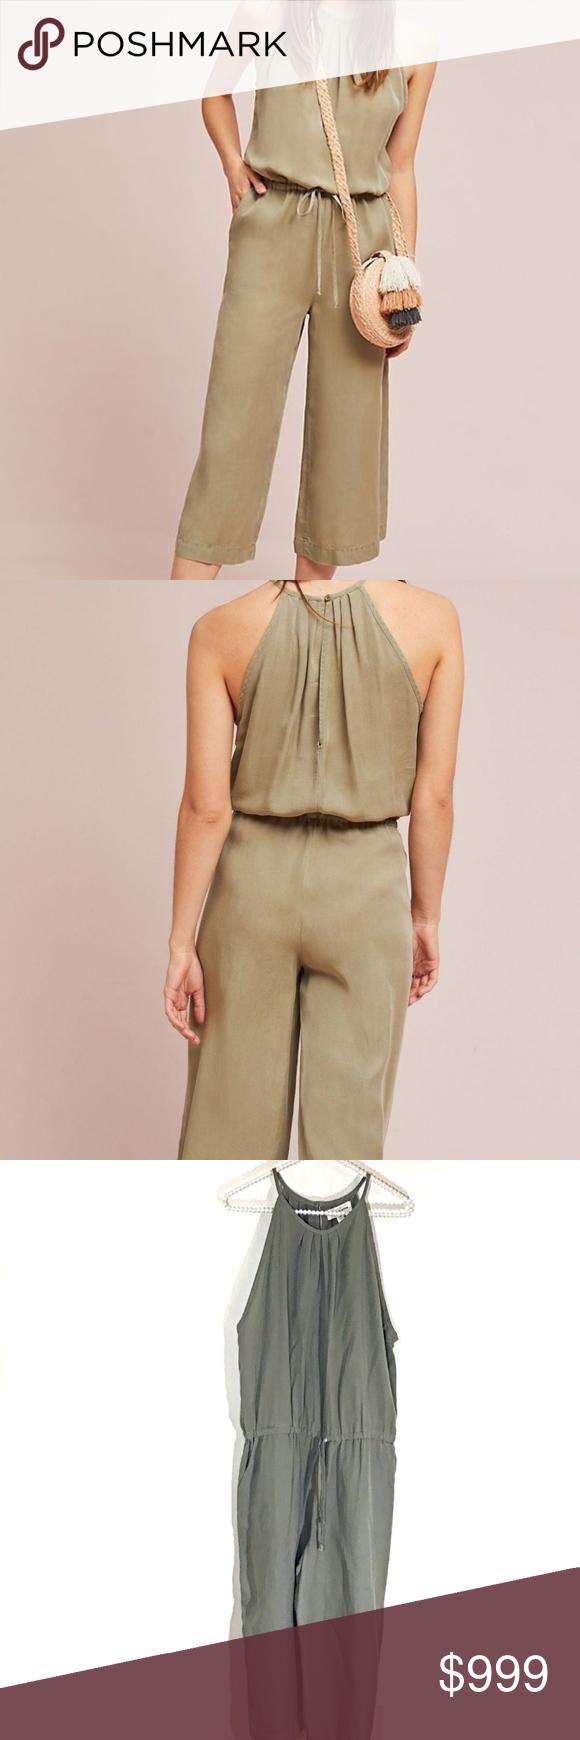 825803d1f43 Cloth   Stone Daytripper Jumpsuit Size Large Cloth   Stone Daytripper  Jumpsuit Style No. 4123259830002